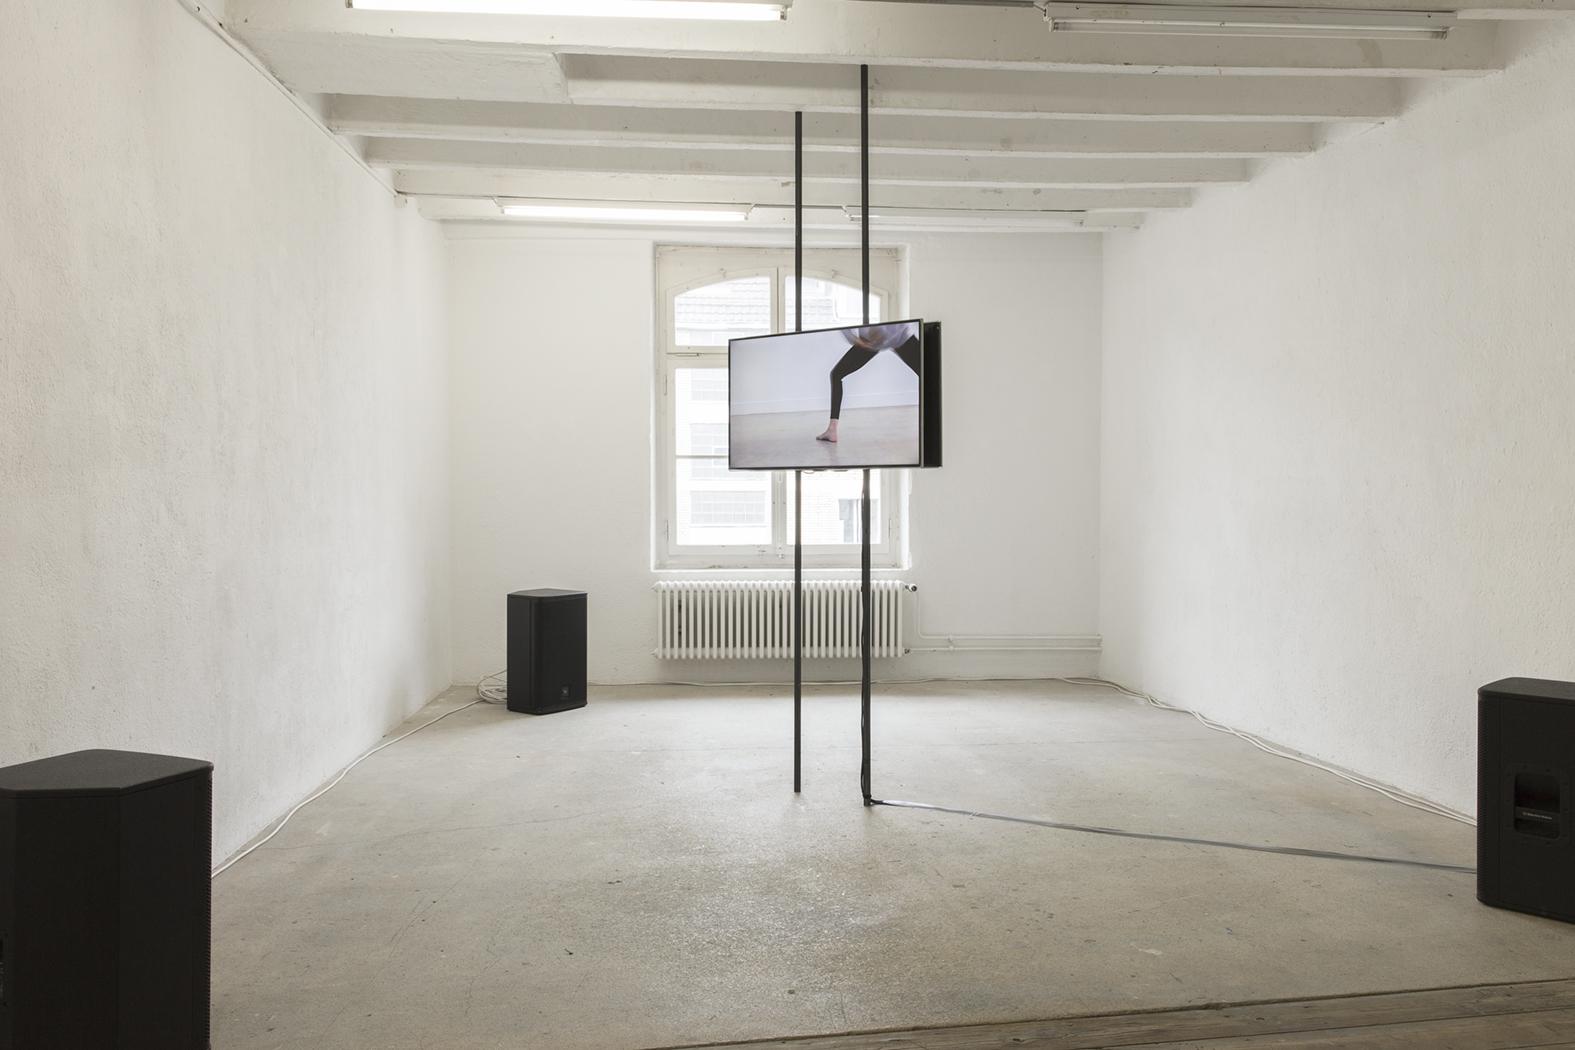 Nicole Bachmann, I Say, 2017. Installation view. Binz39, Zurich, CH.